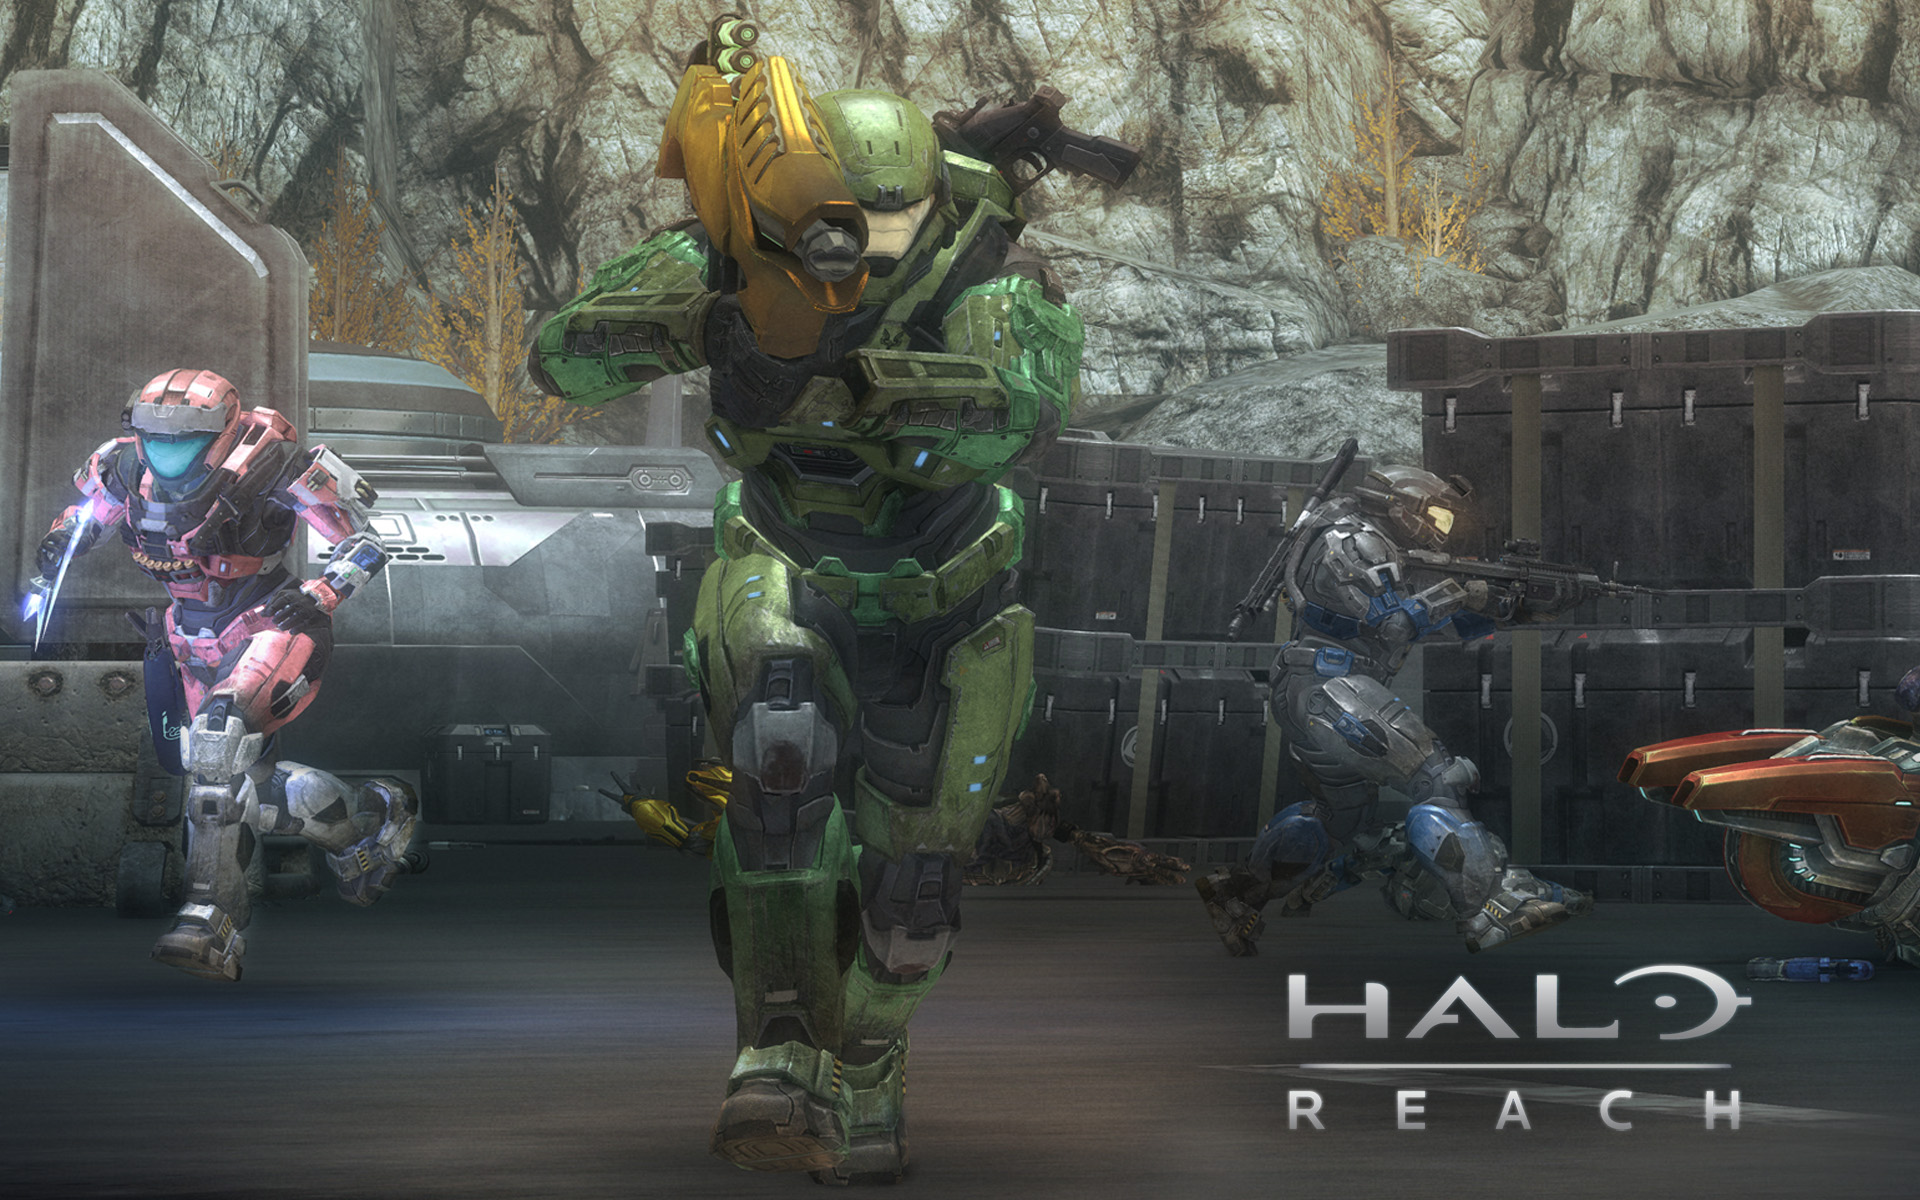 Halo Reach Wallpaper HD #6797556